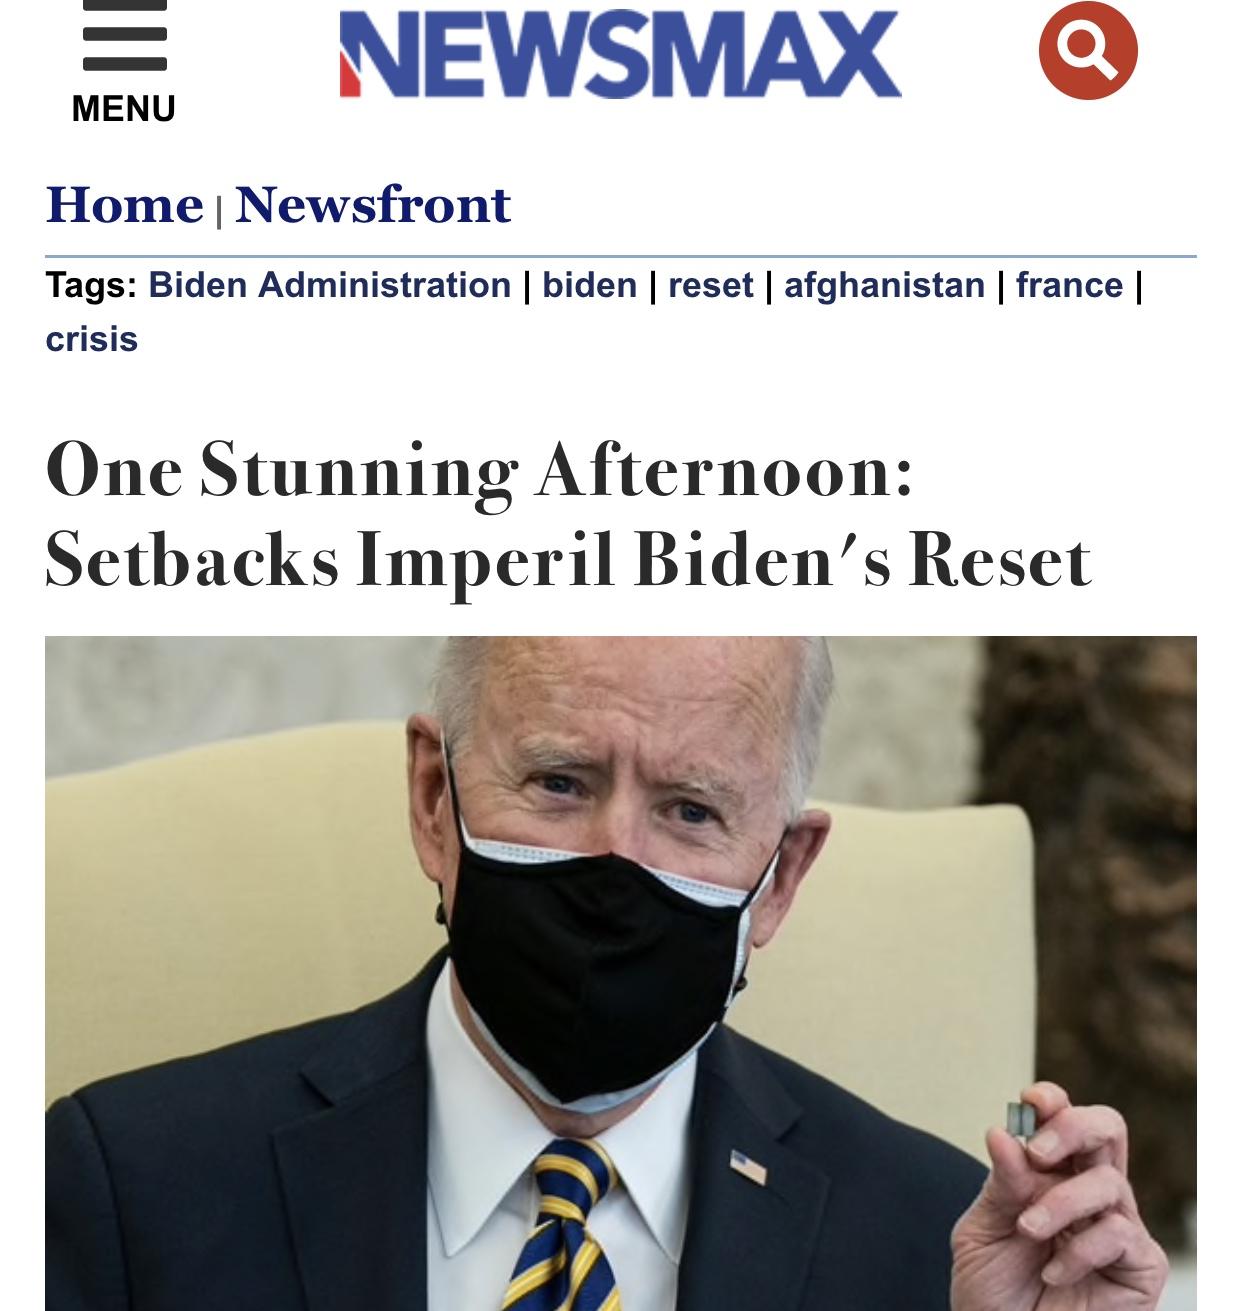 One Stunning Afternoon: Setbacks Imperil Biden's Reset